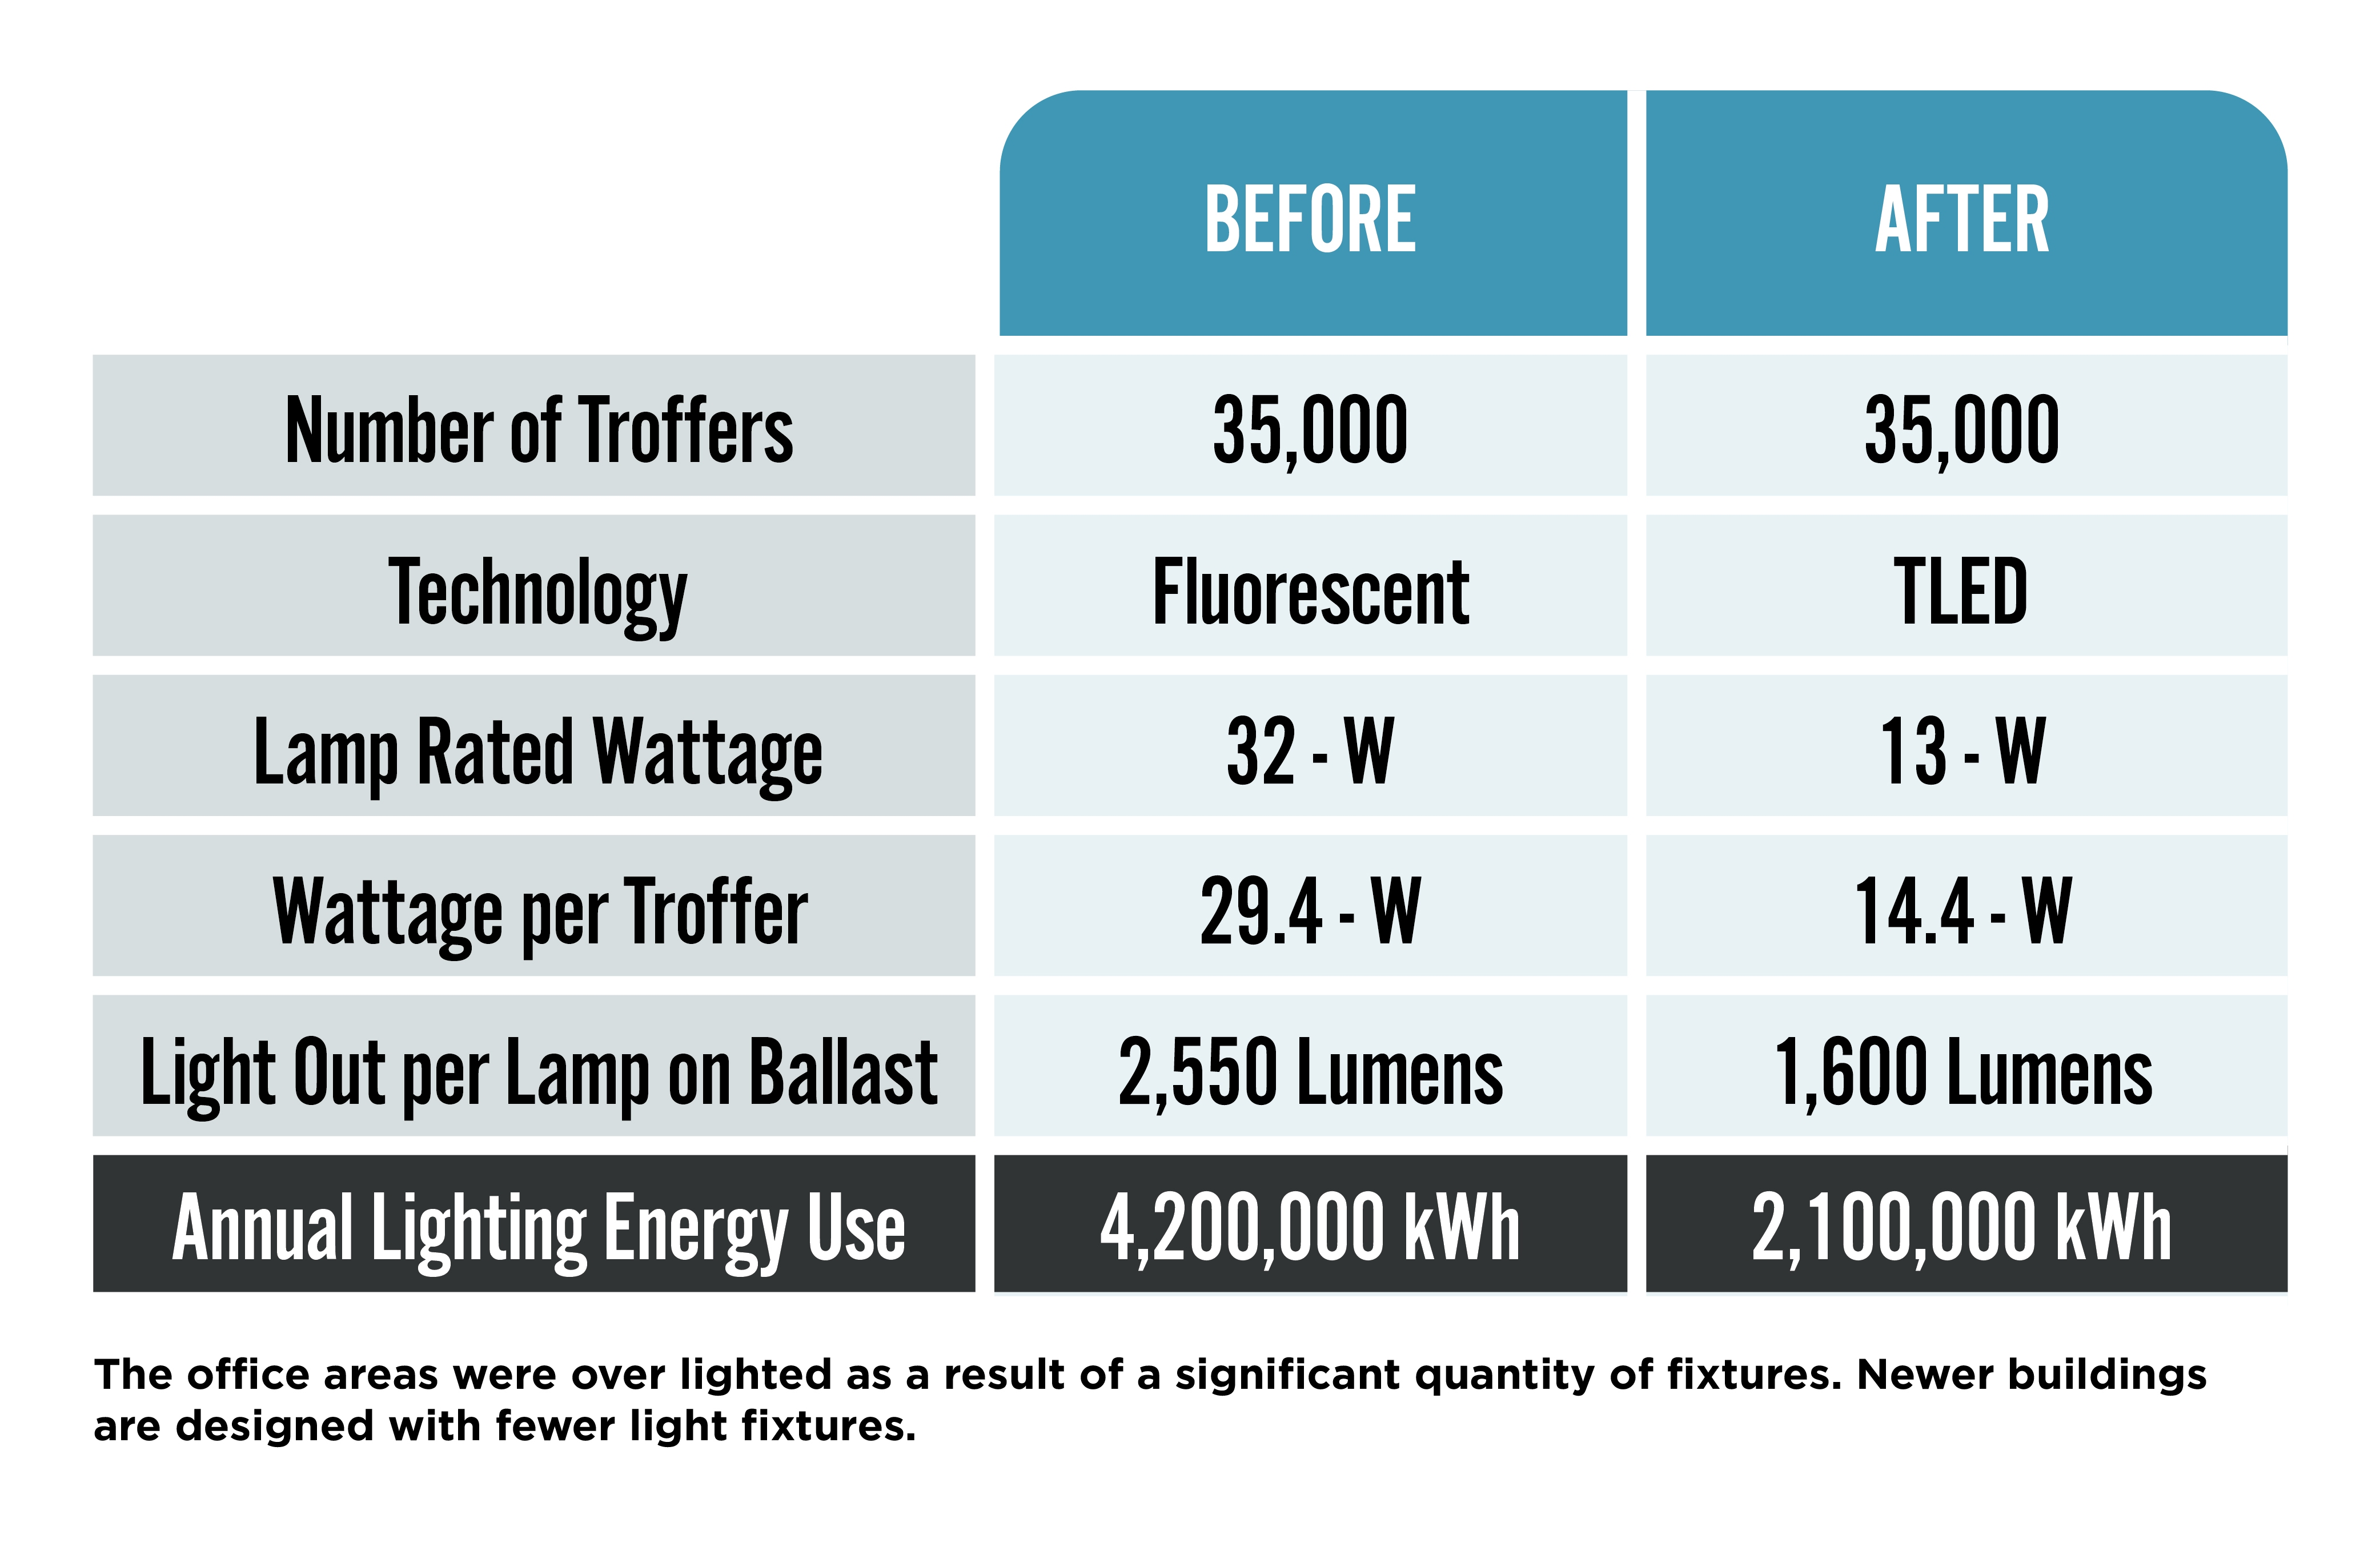 Annual Lighting Energy Use